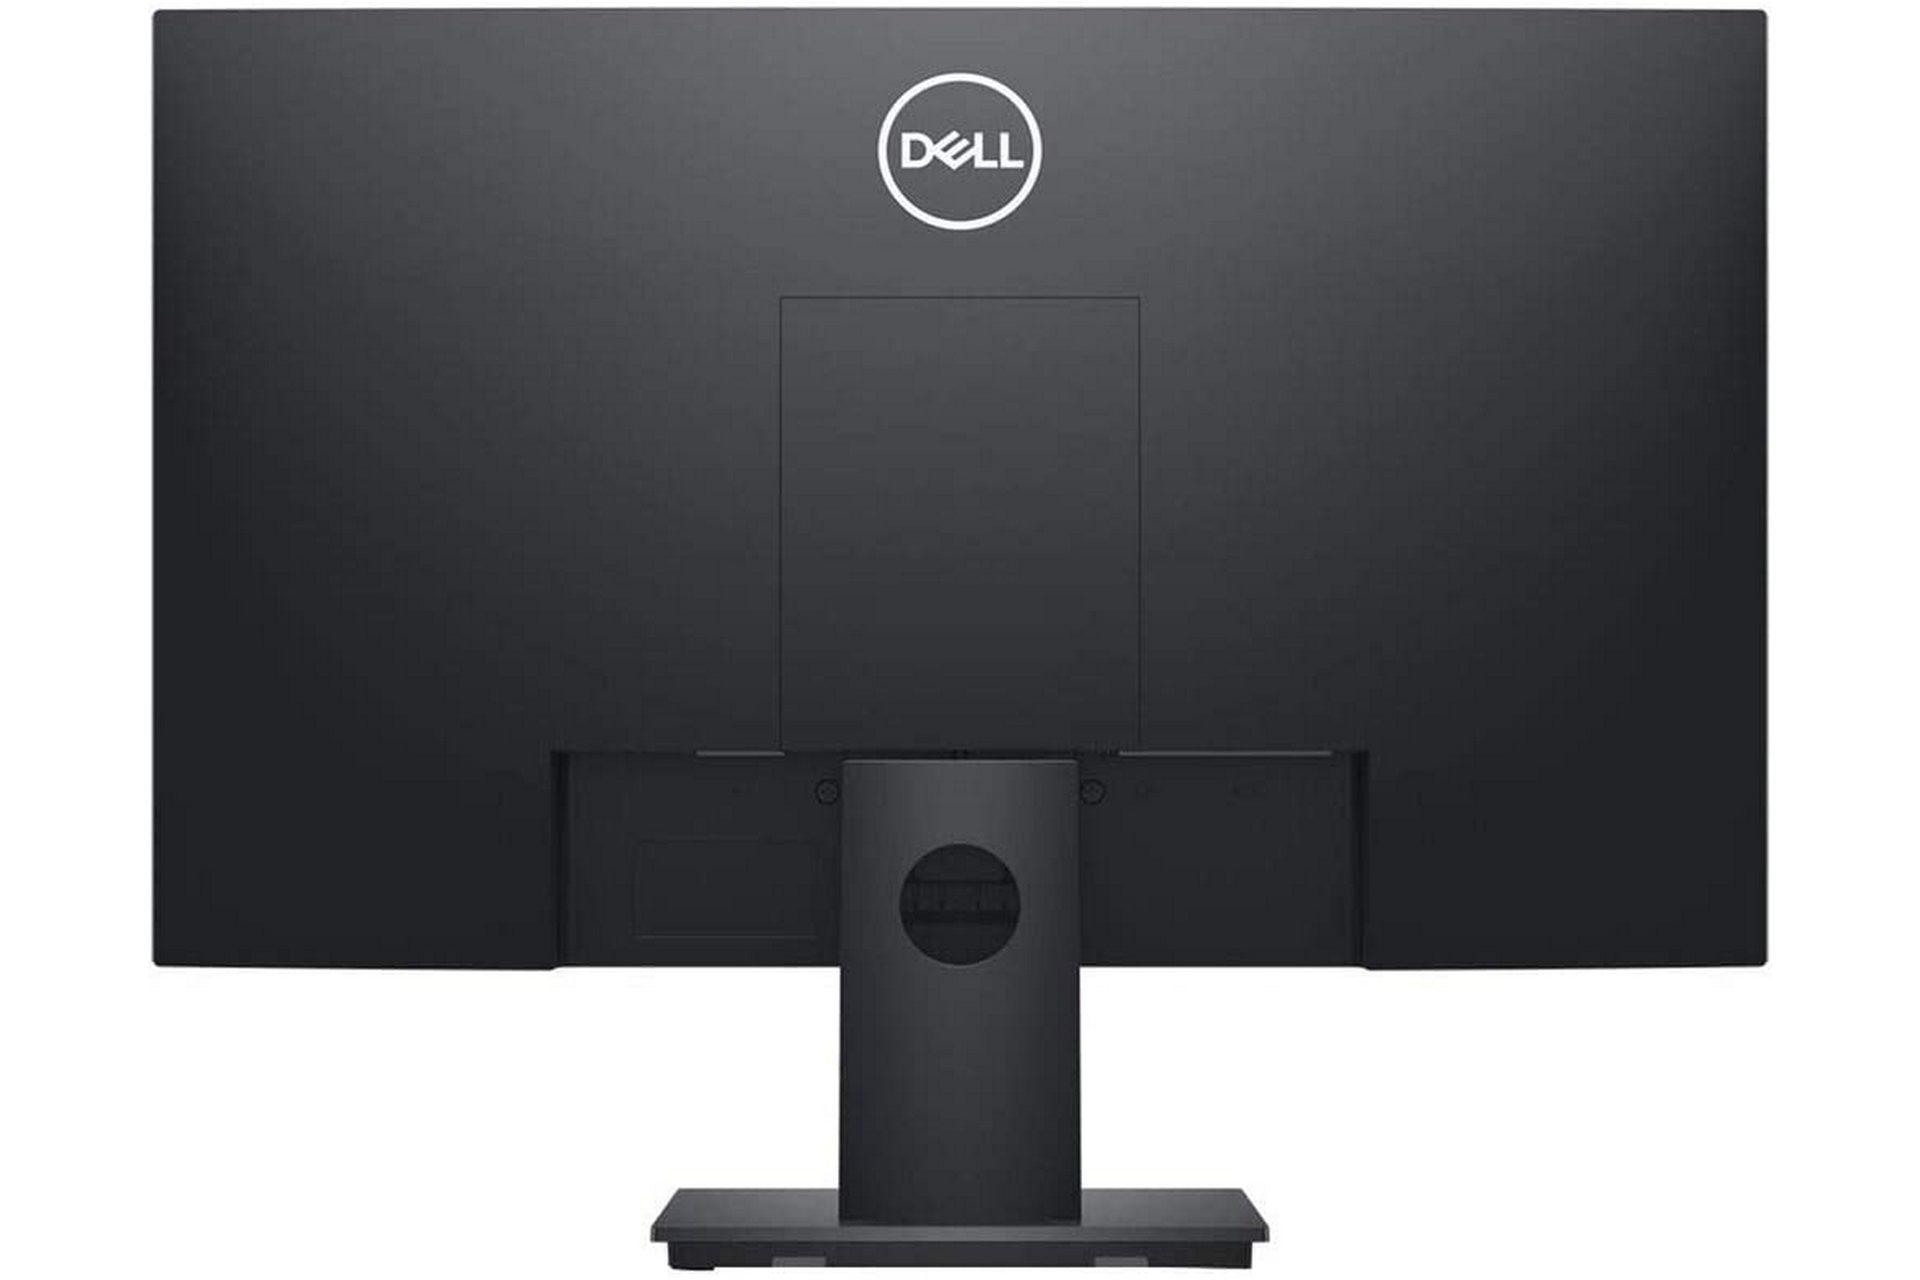 Màn hình Dell E2720HS 27inch/FHD/IPS/60Hz